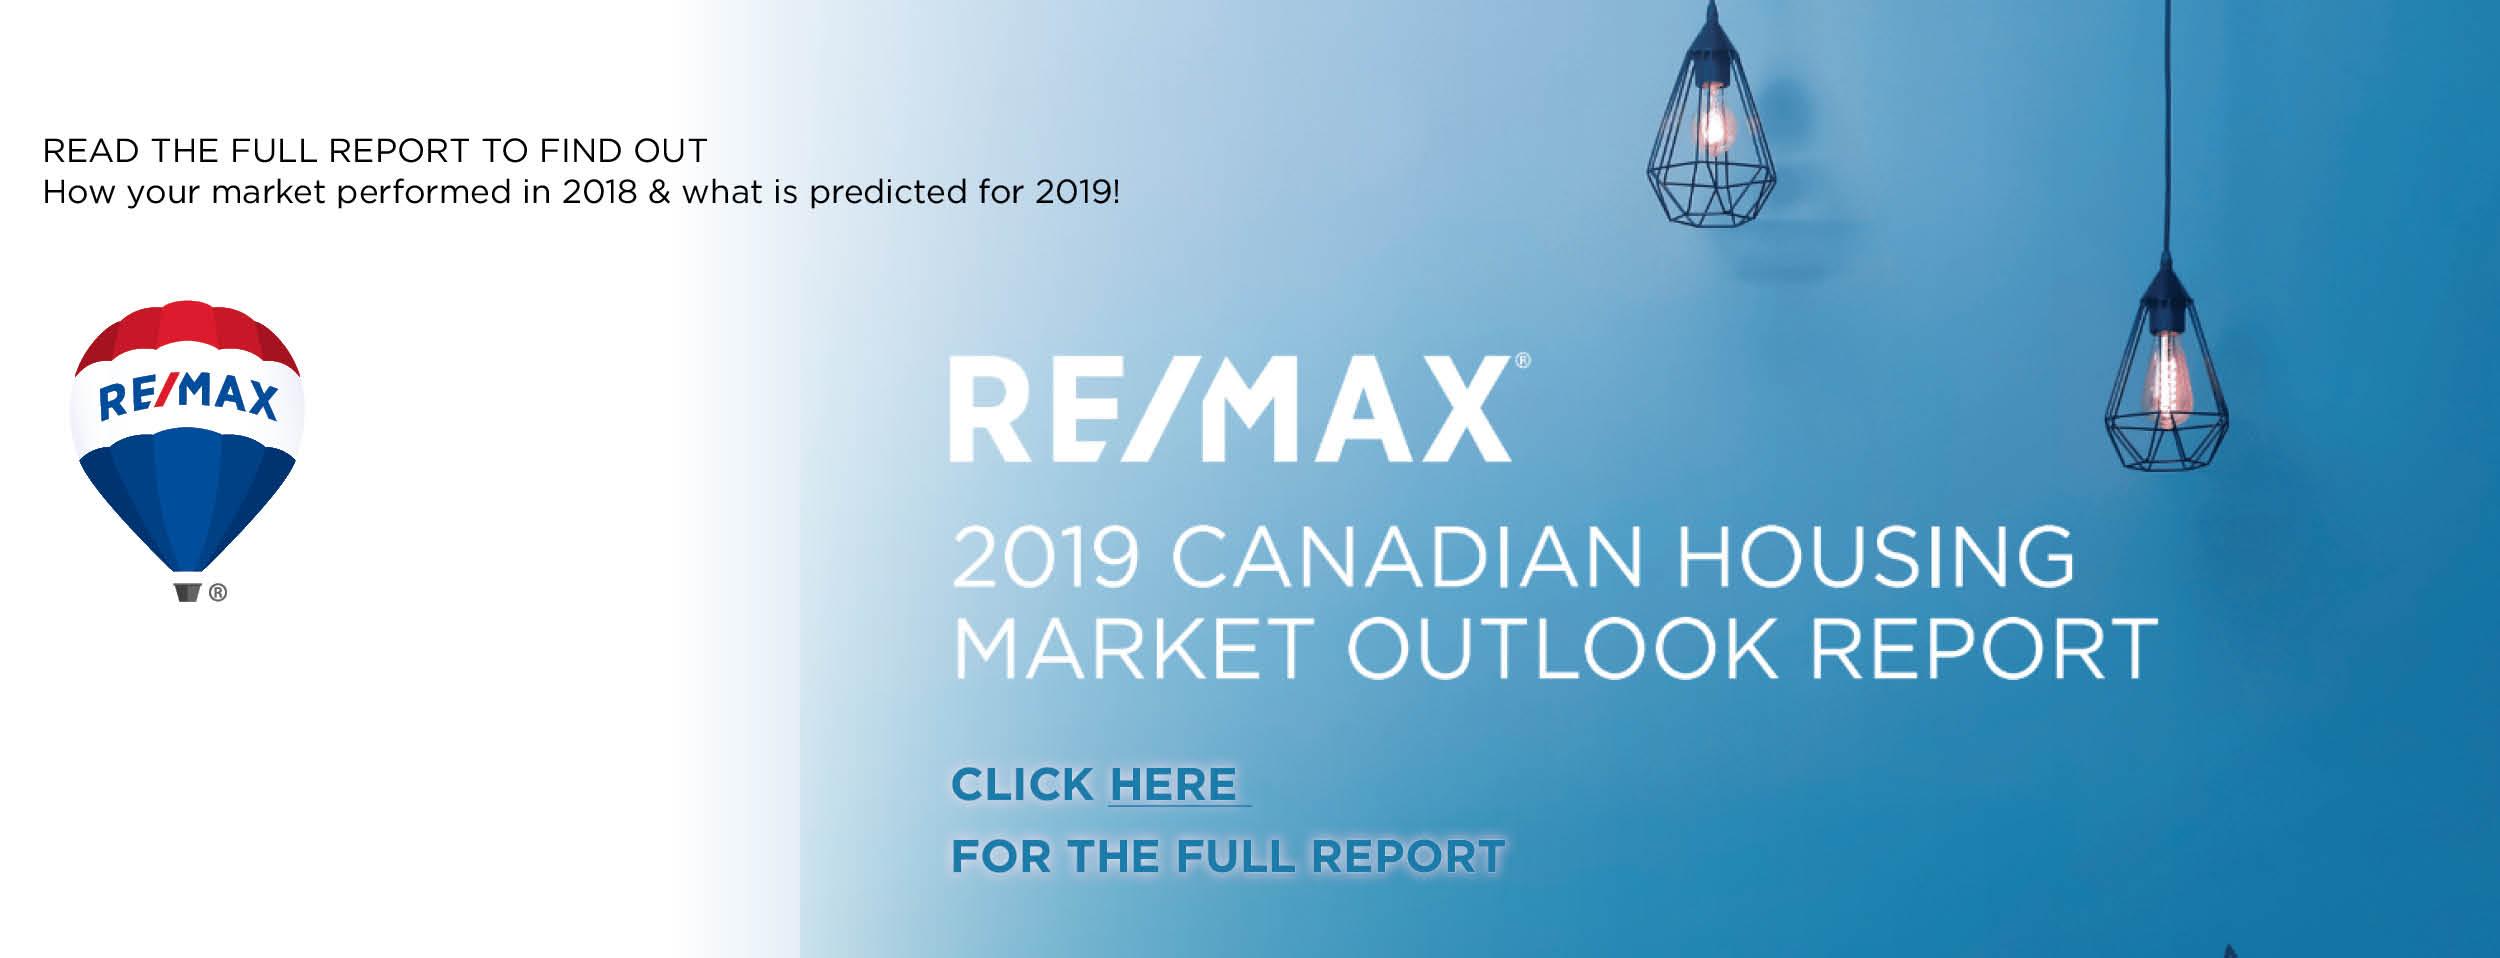 WEBIMAGES: 2019 Housing Outlook Report.jpg